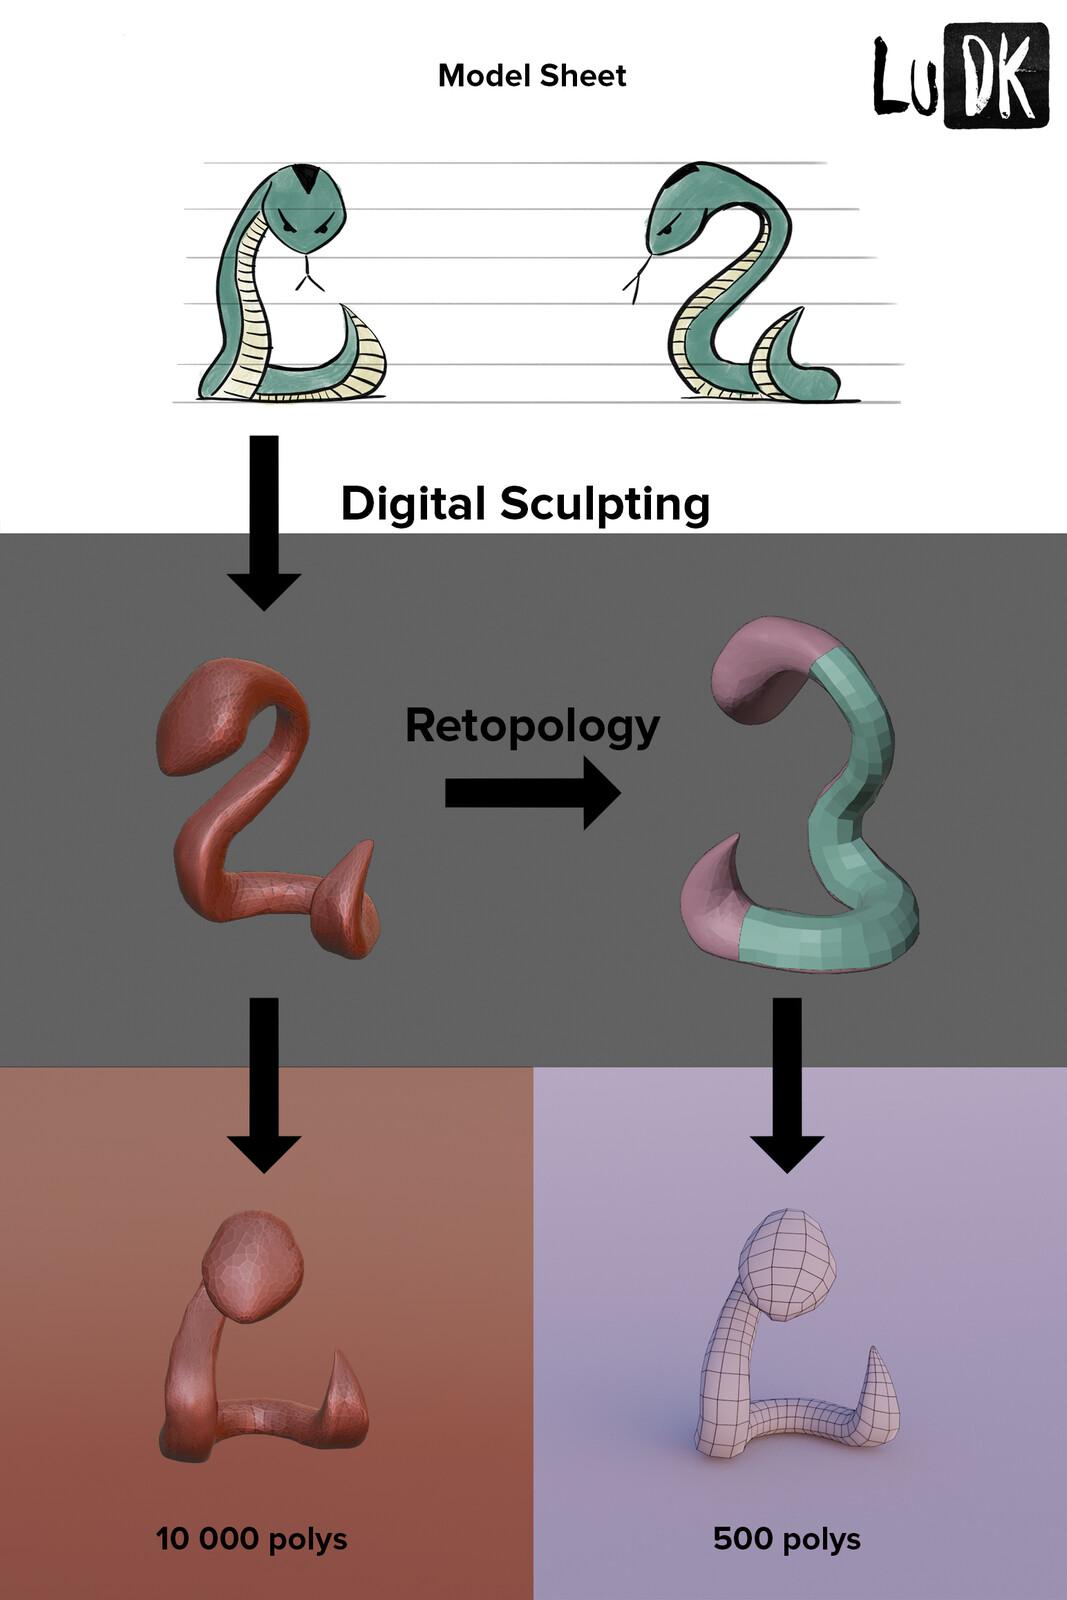 Digital Sculpting/Retopology